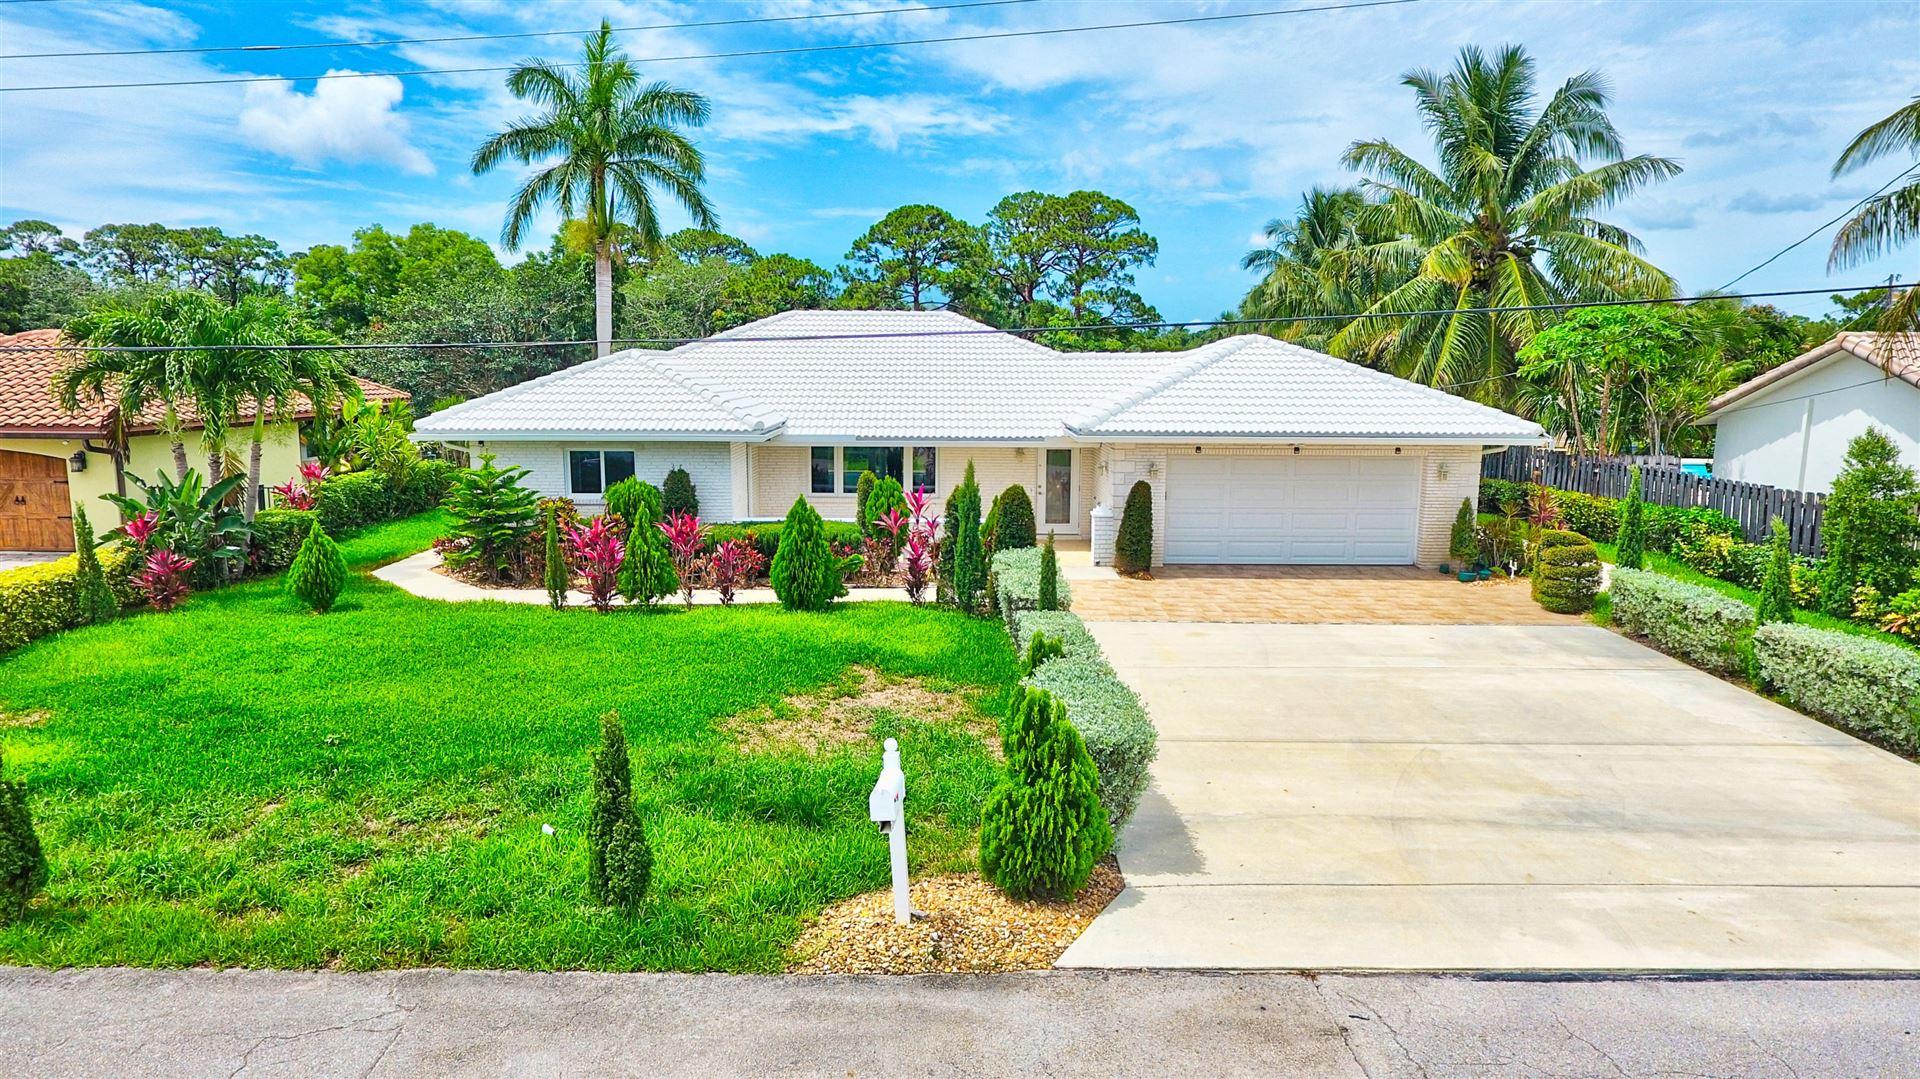 Photo of 2036 Sharon Street, Boca Raton, FL 33428 (MLS # RX-10726483)